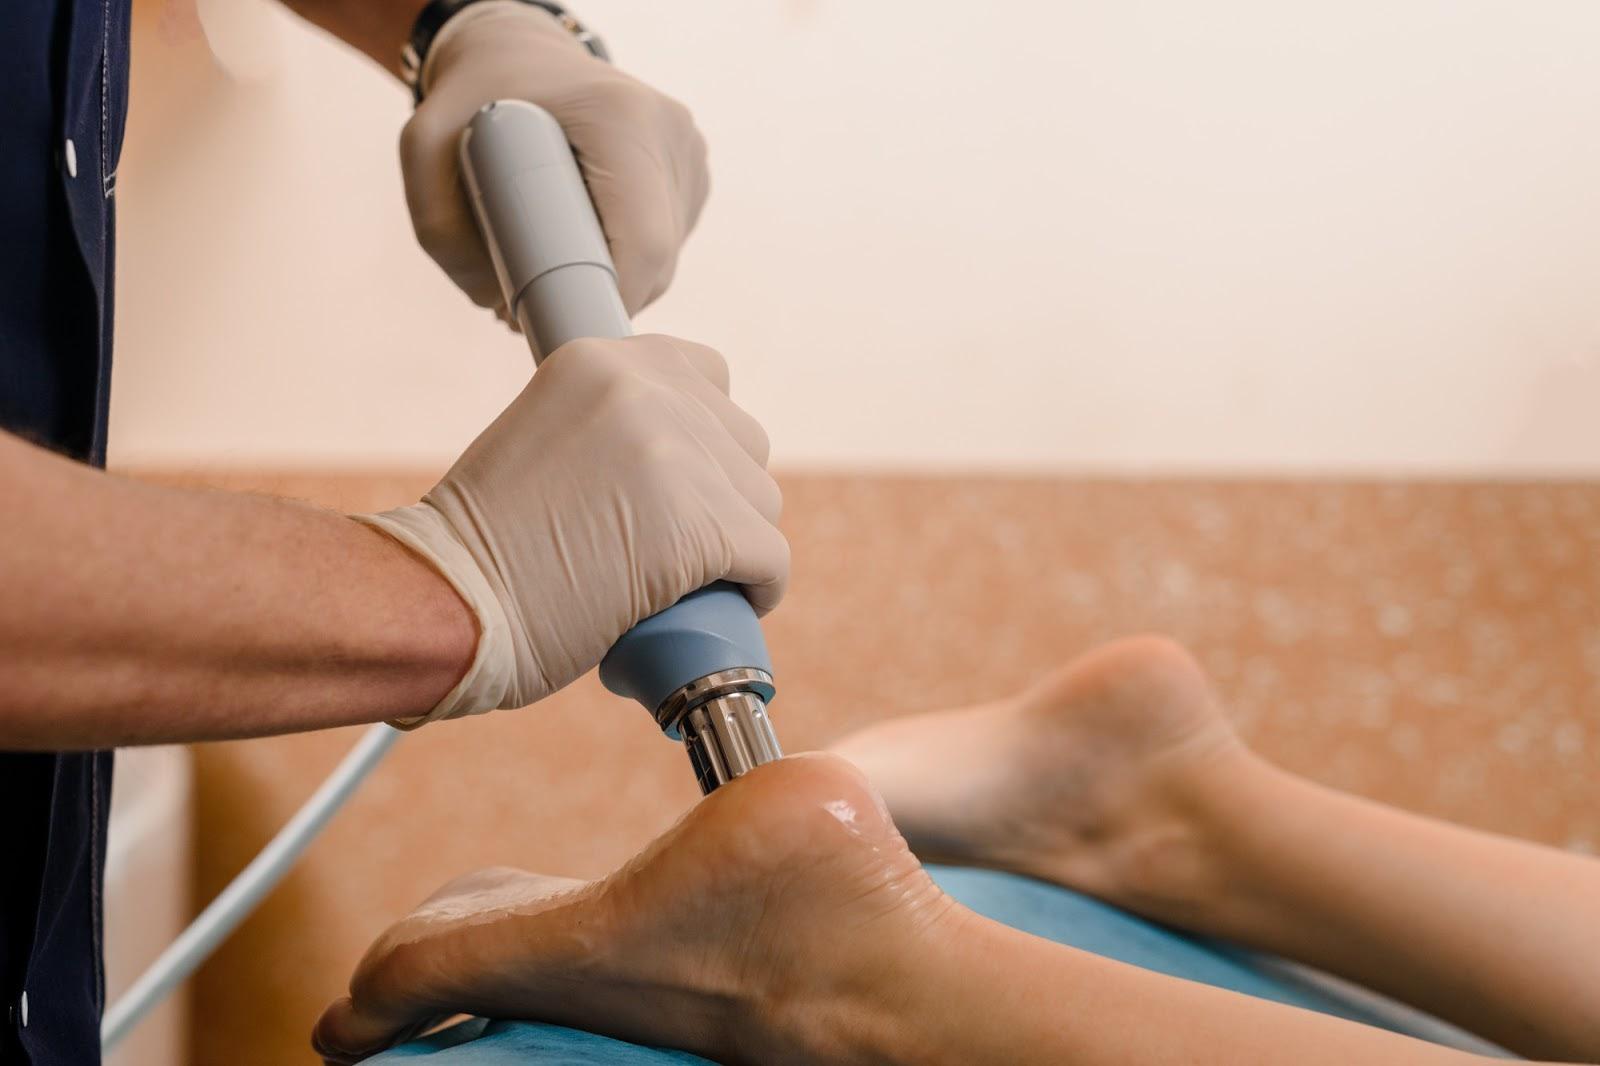 shockwave therapy - tool applying pressure